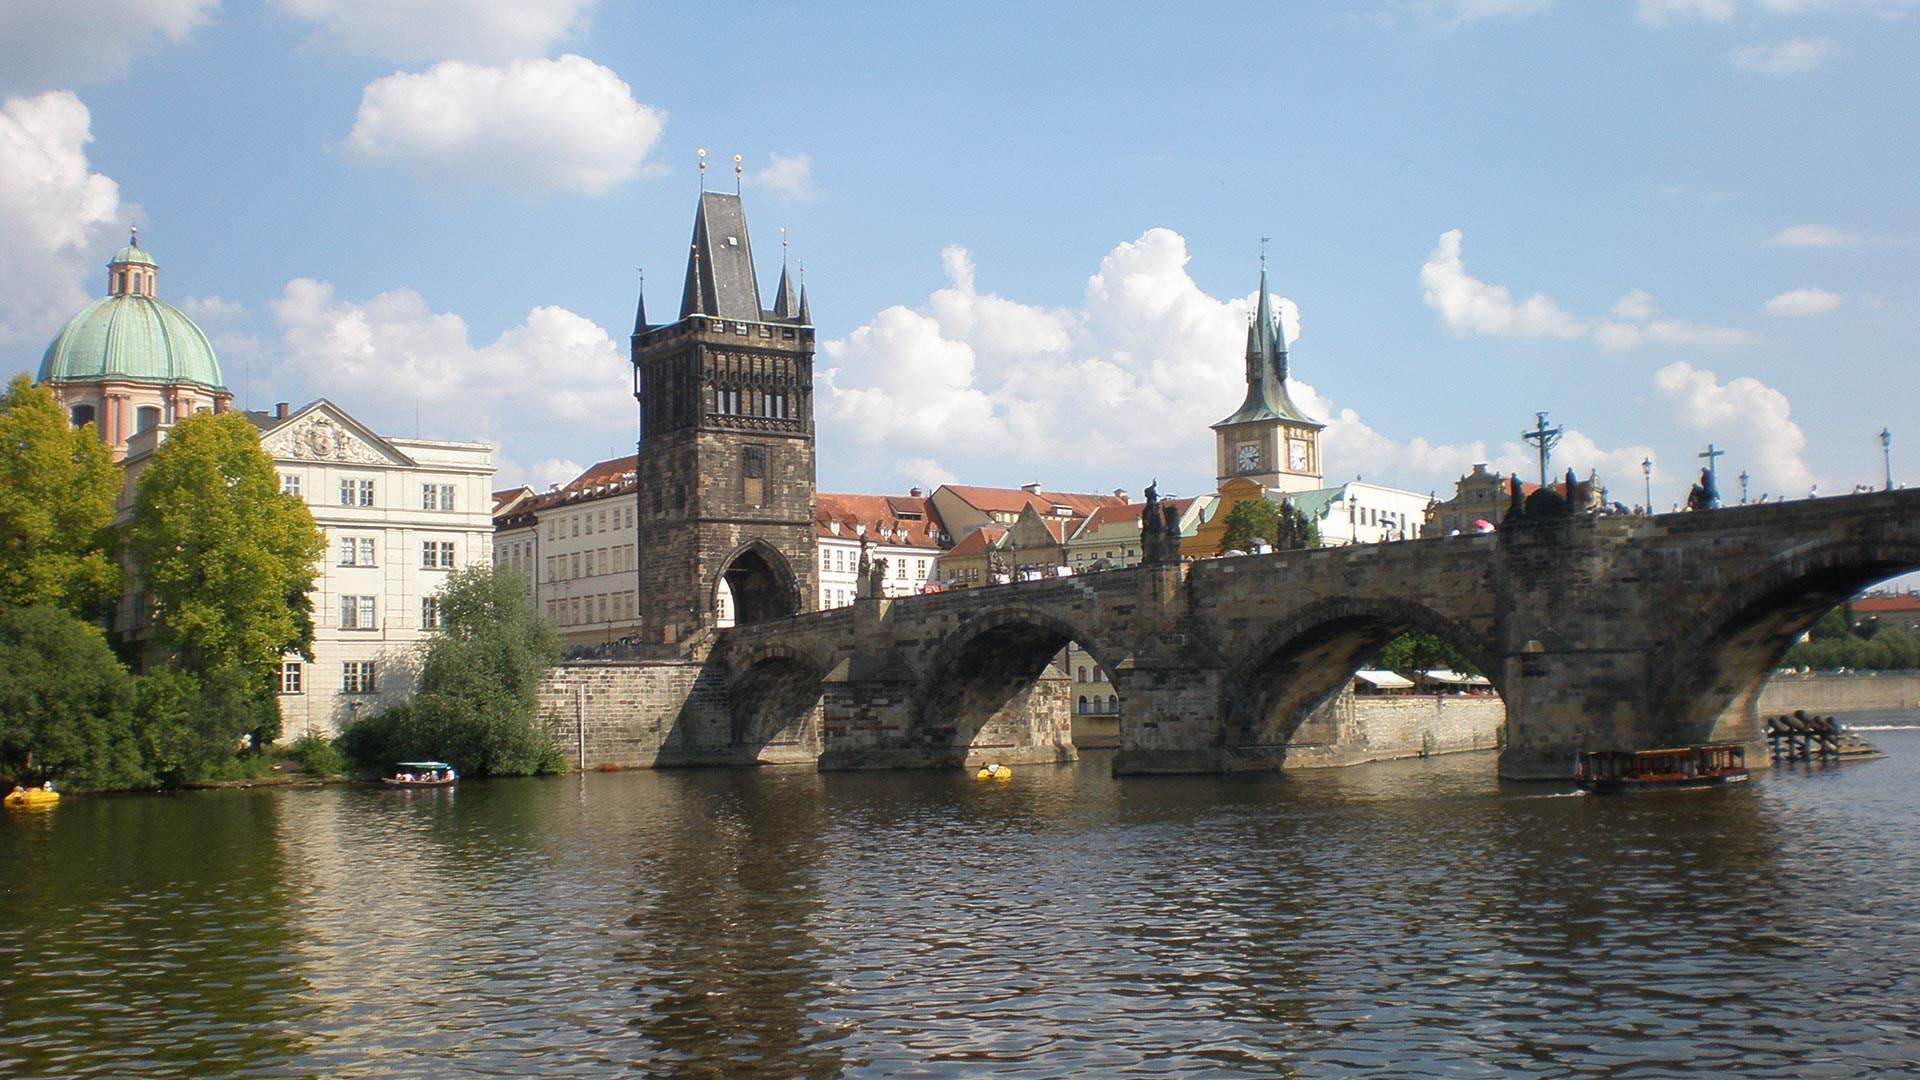 feat-Charles-Bridge-Old-Town-Bridge-Tower